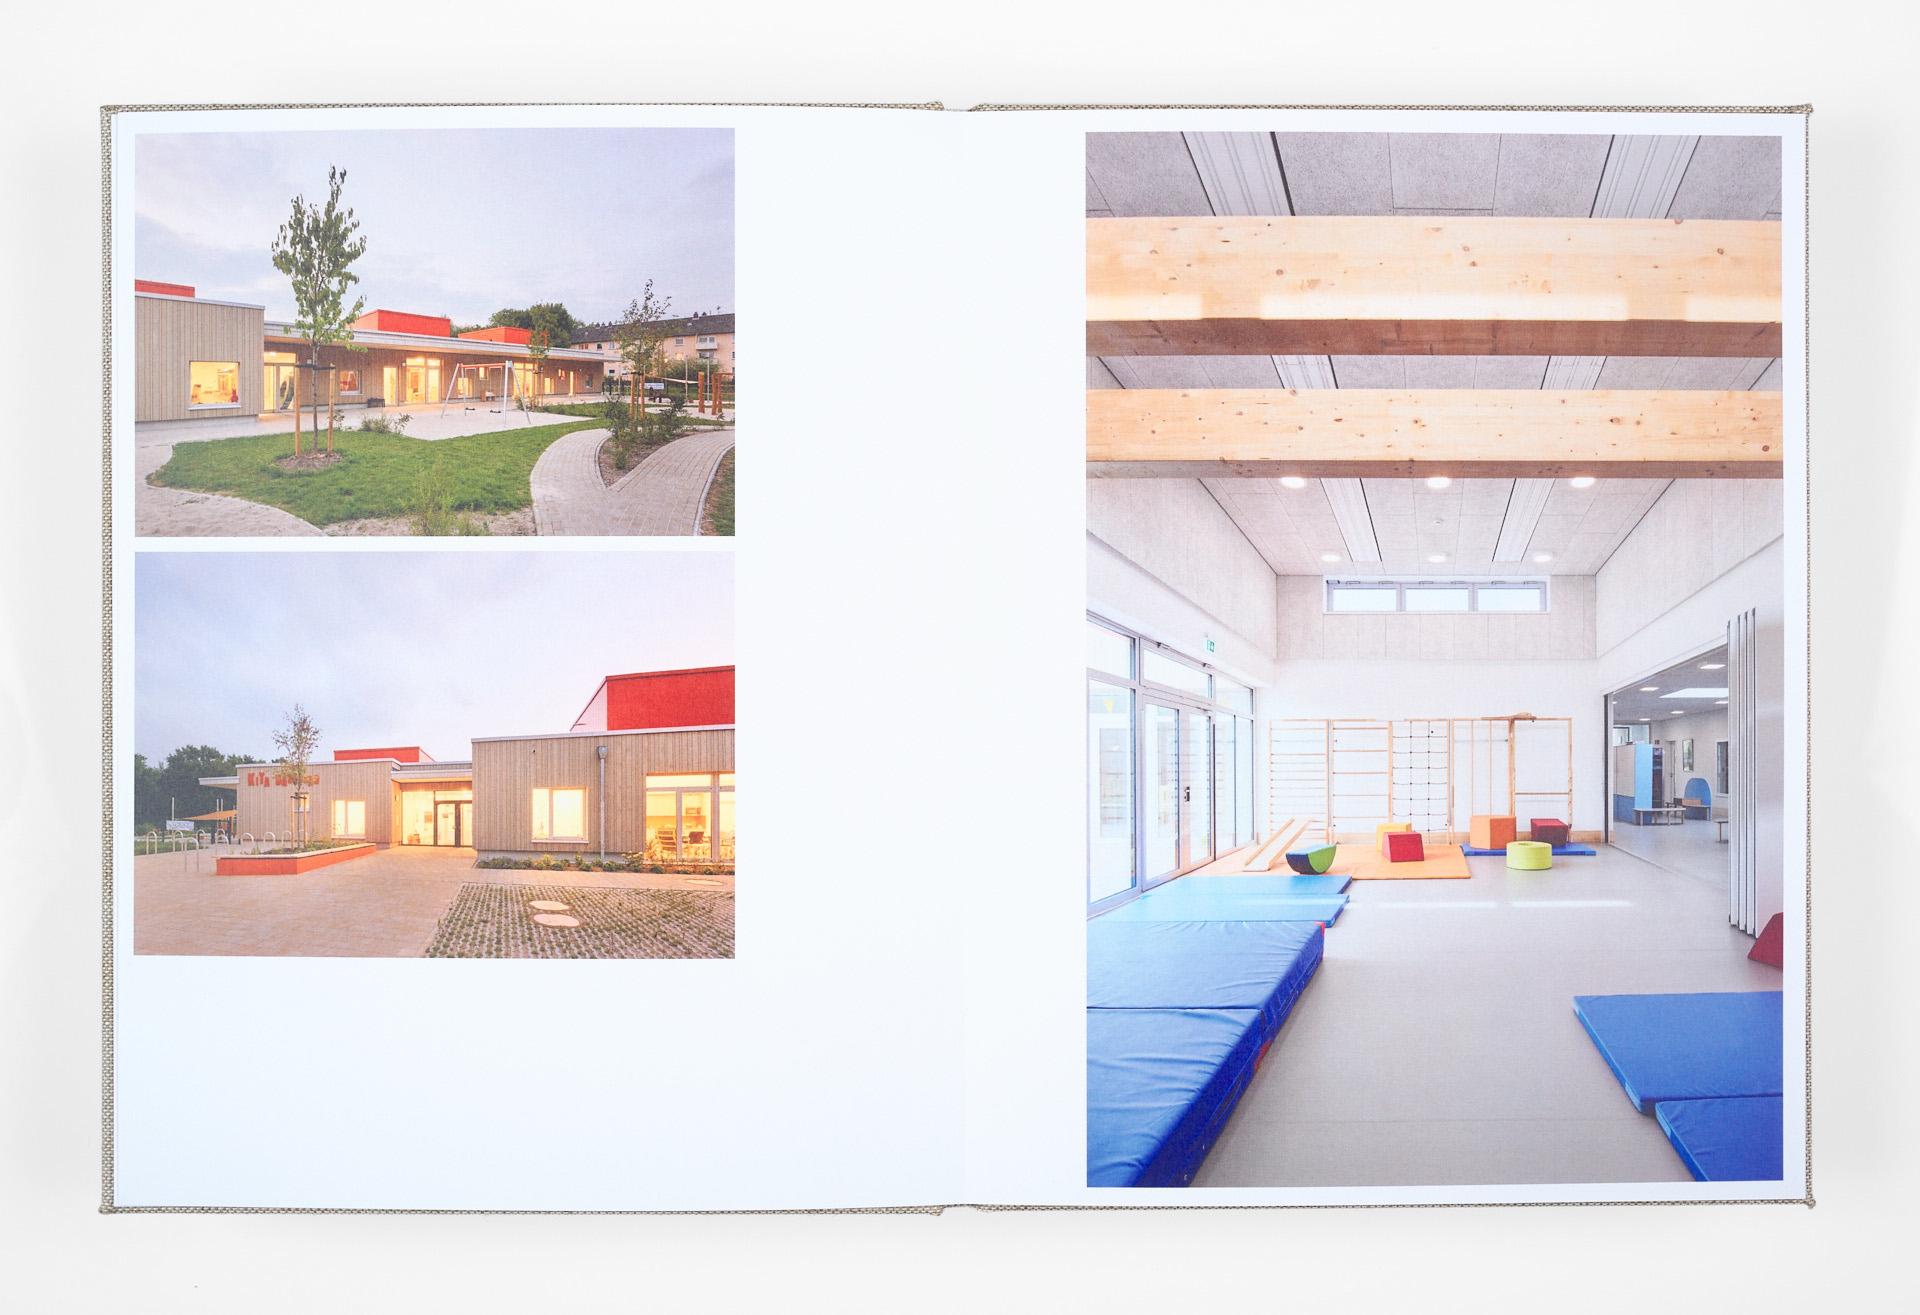 Reproduktionen Portfolio Architektur, Caspar Sessler, Bremen, 2019-03-26